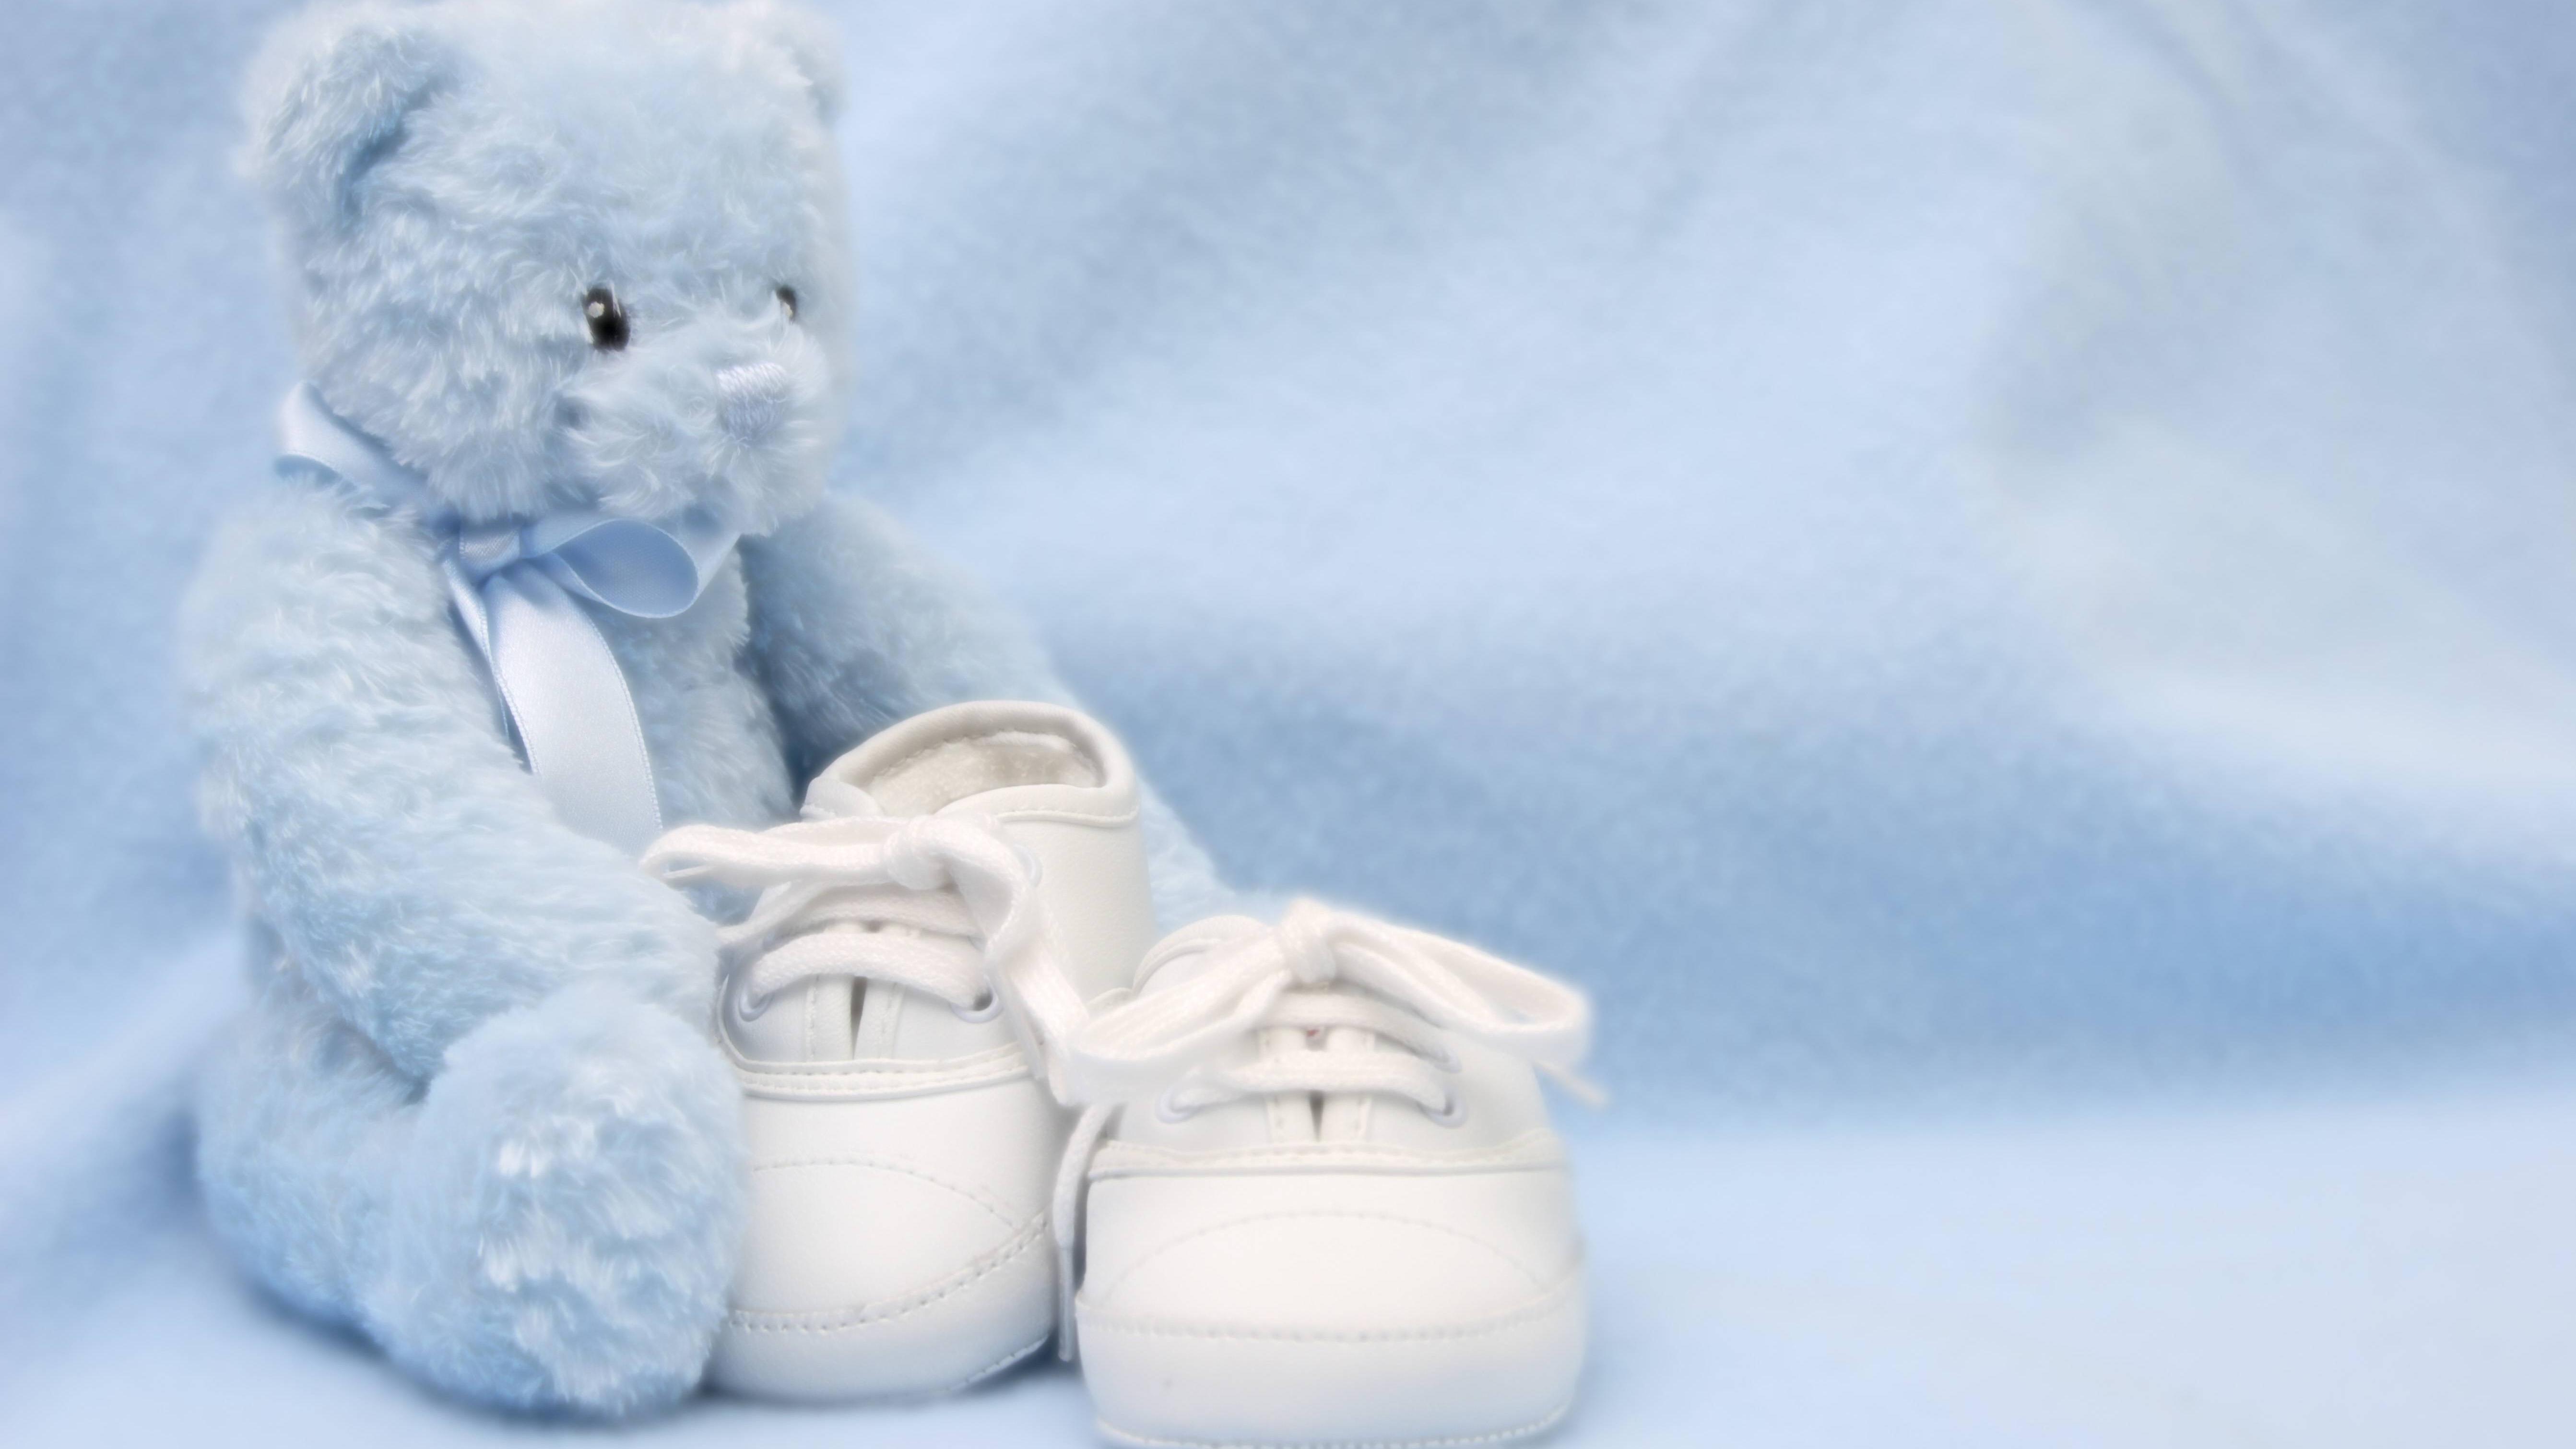 Baby an Kuscheltier gewöhnen - 3 Tipps